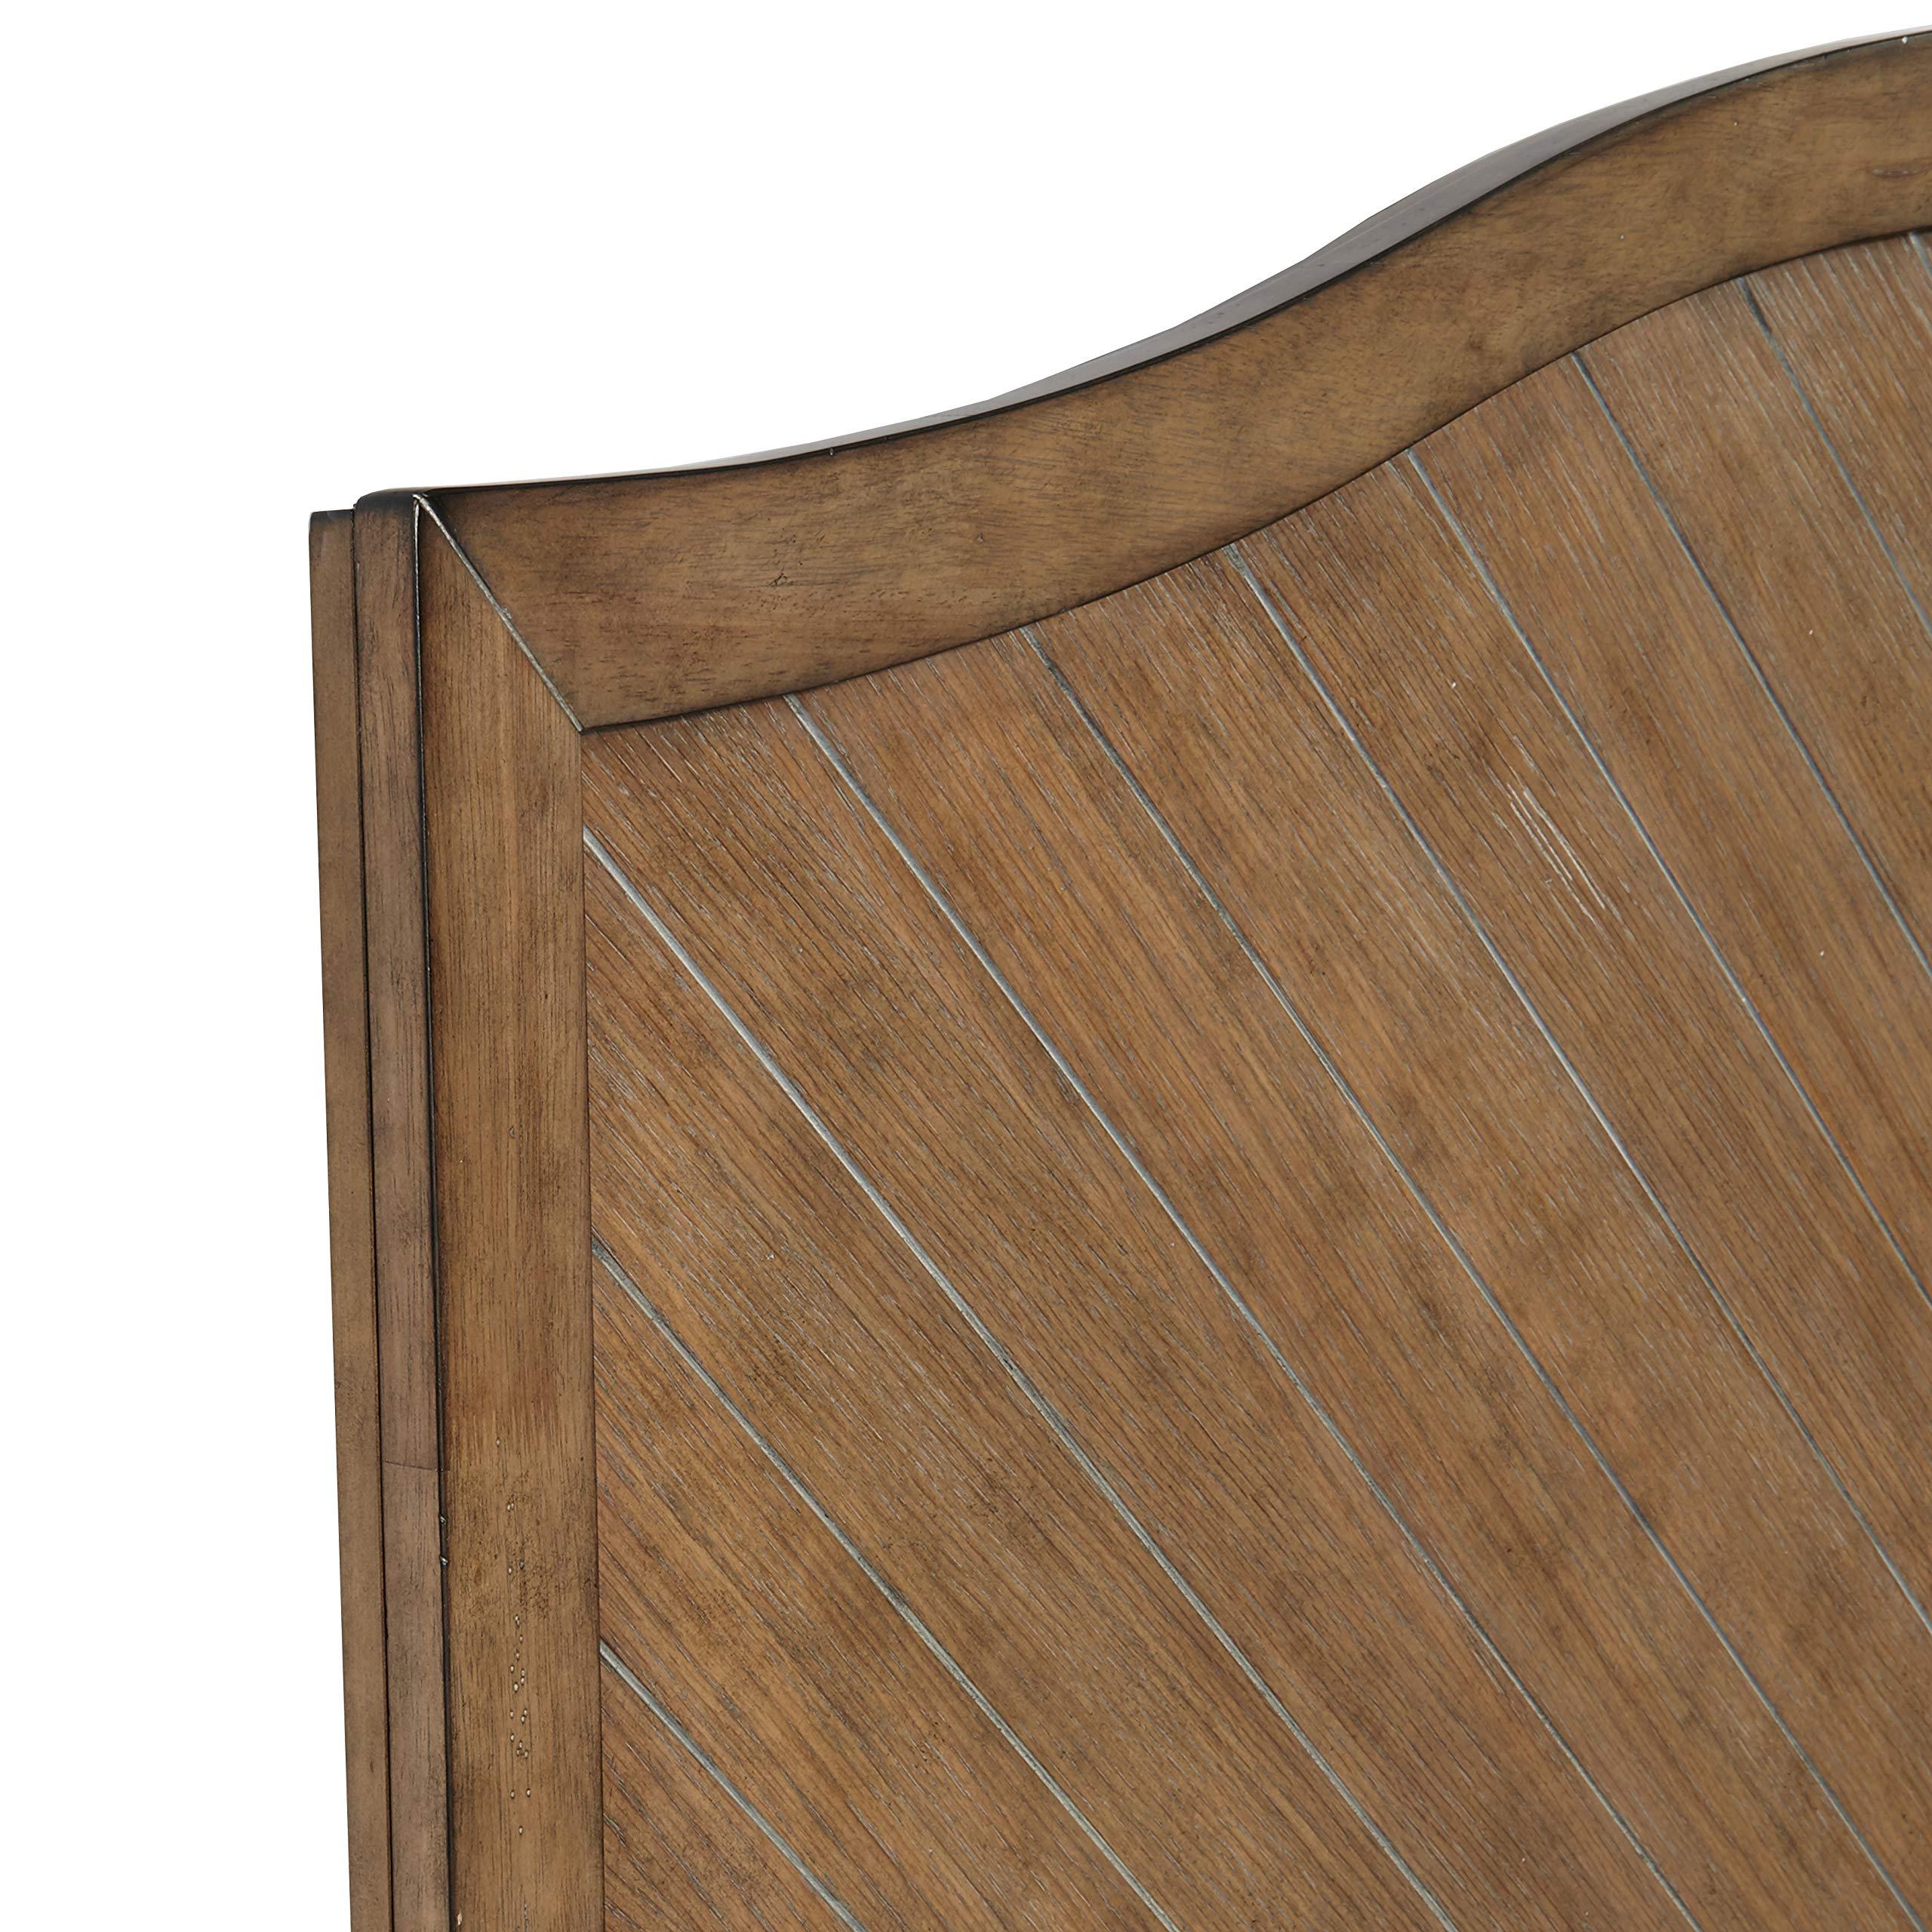 Pulaski DS-D112001 Camel Back Chevron Patterned Wood Headboard, Queen, Brown